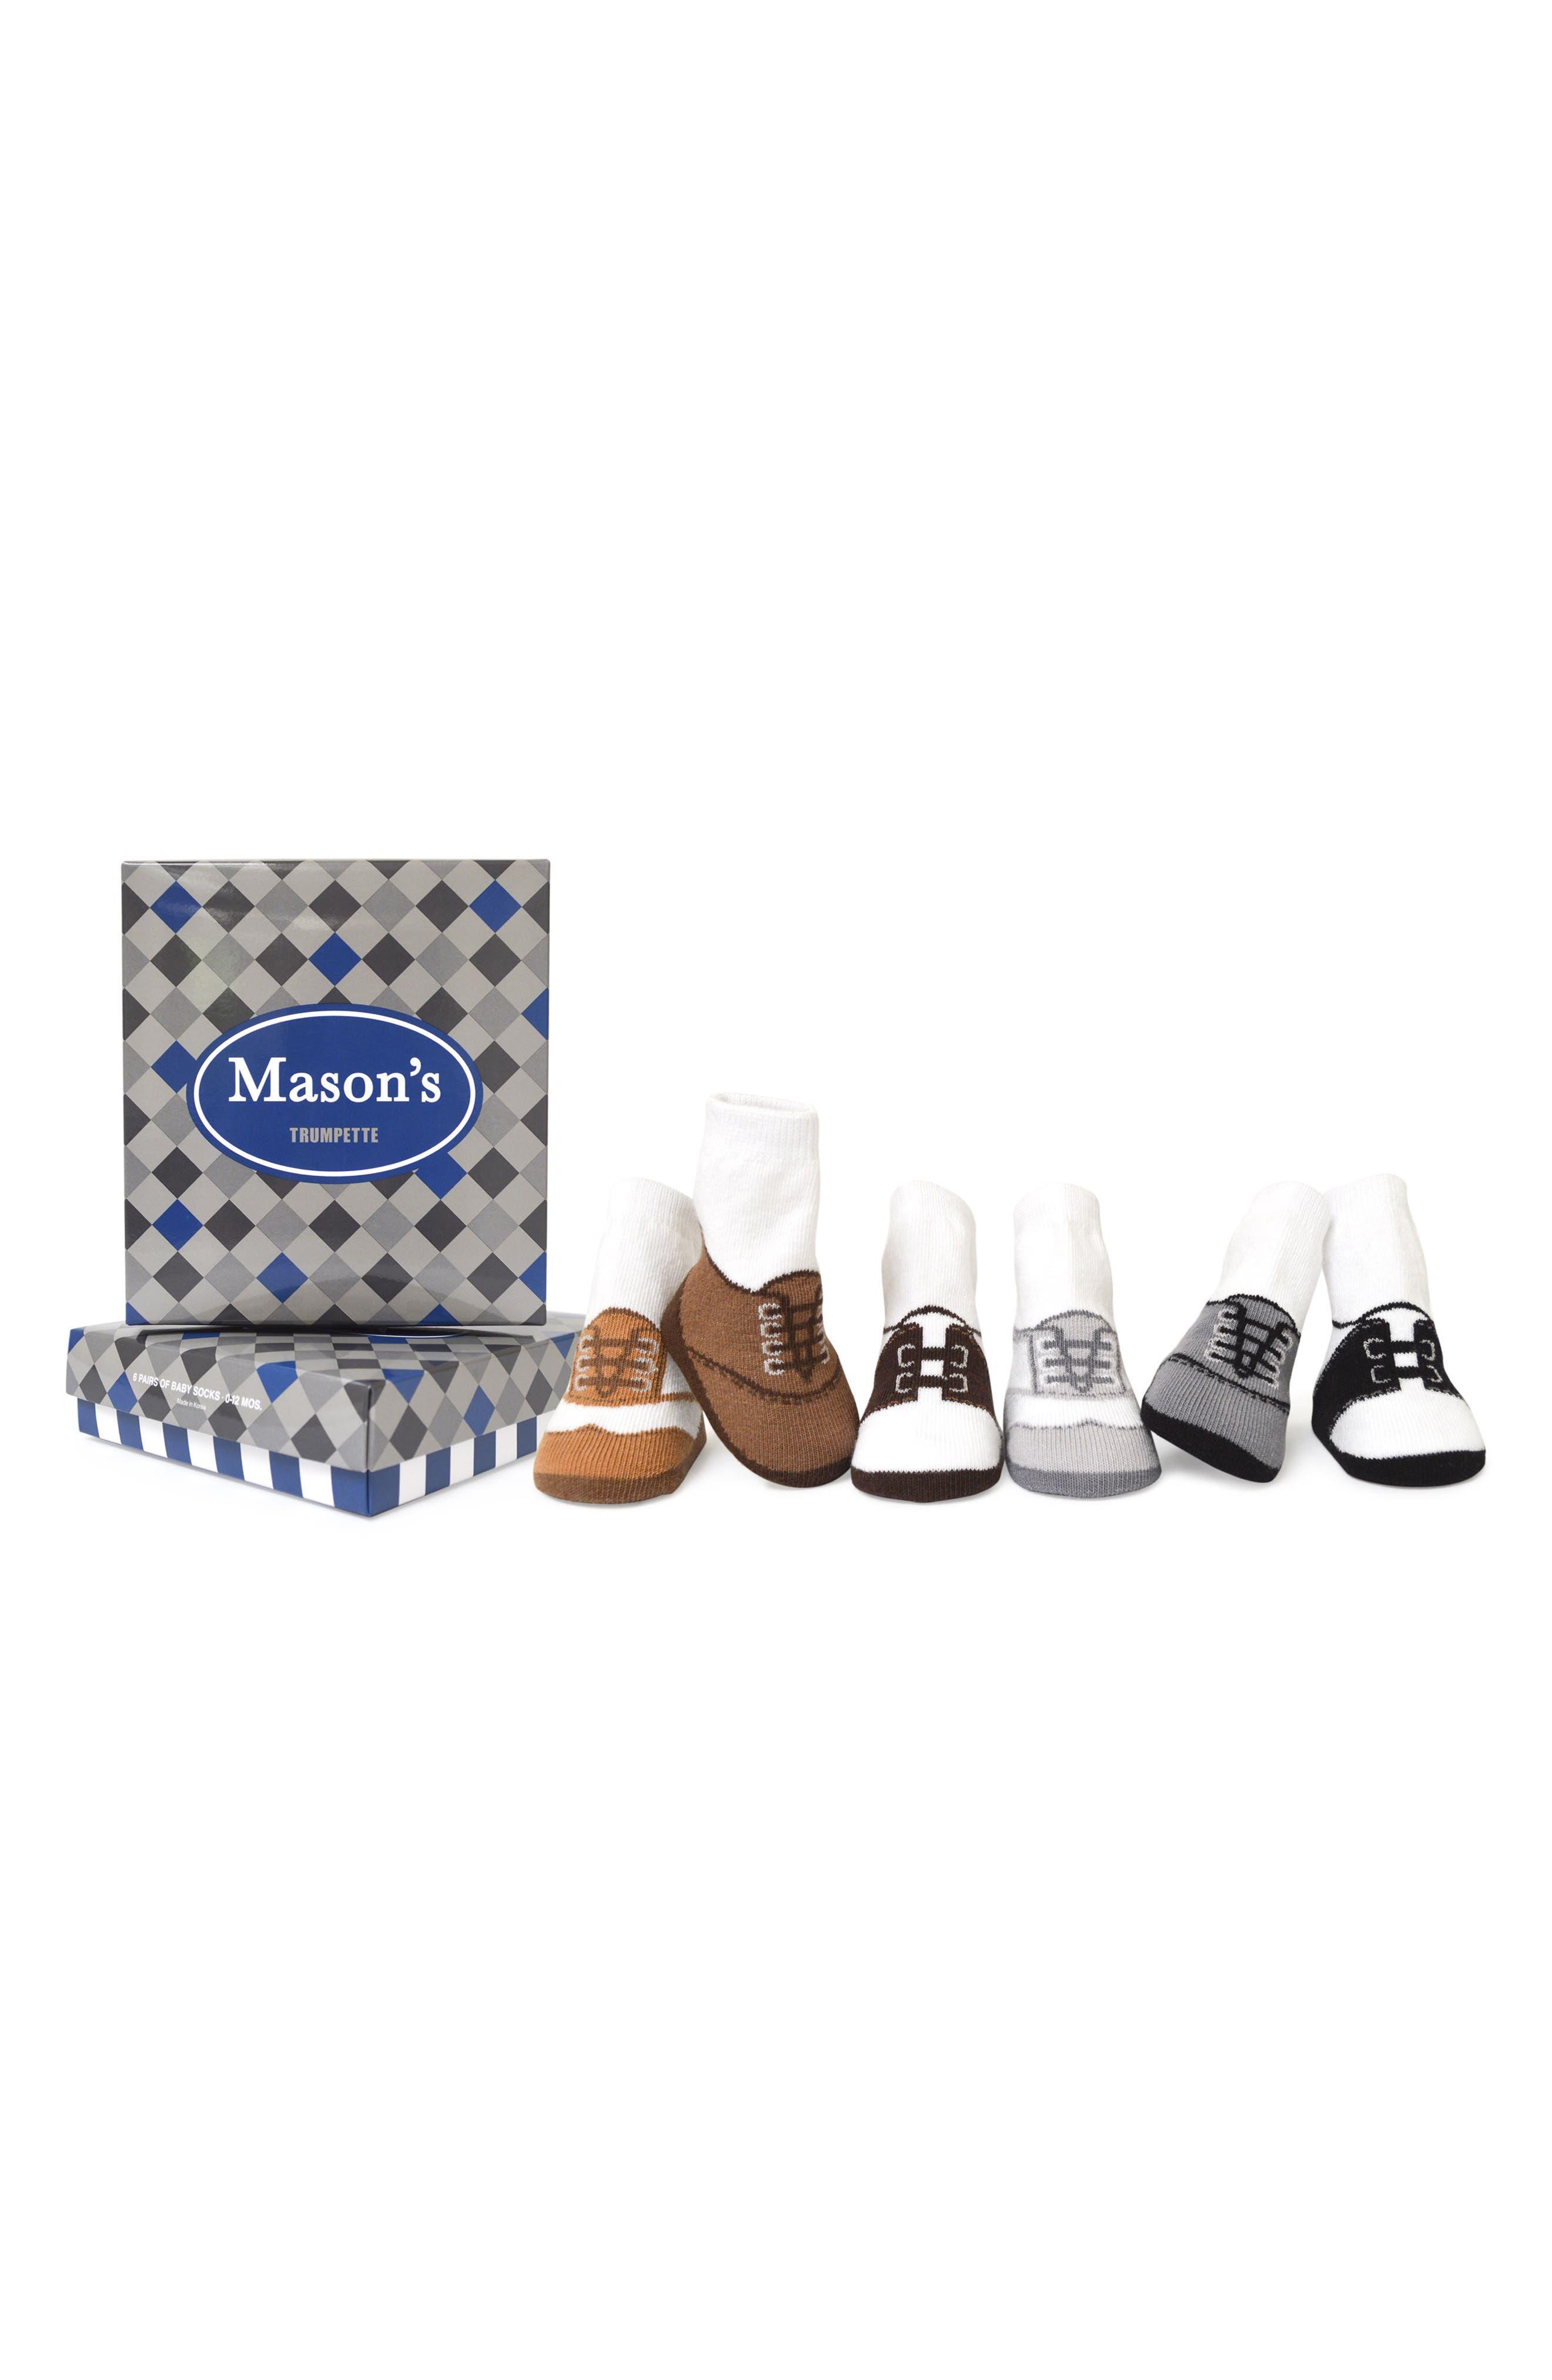 Mason's 6-Pack Socks,                         Main,                         color, 100